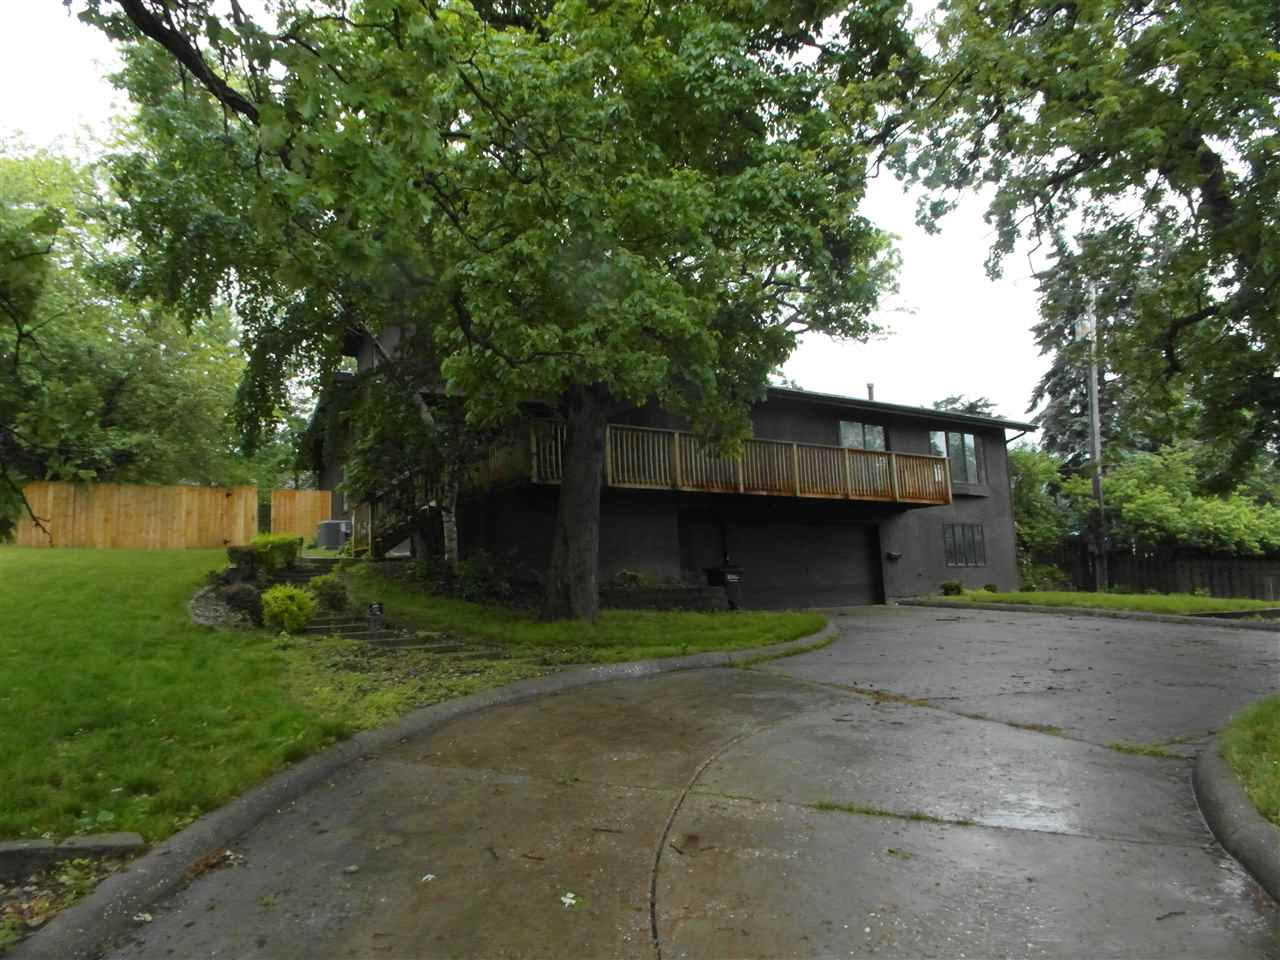 Real Estate for Sale, ListingId: 31589894, Davenport,IA52804